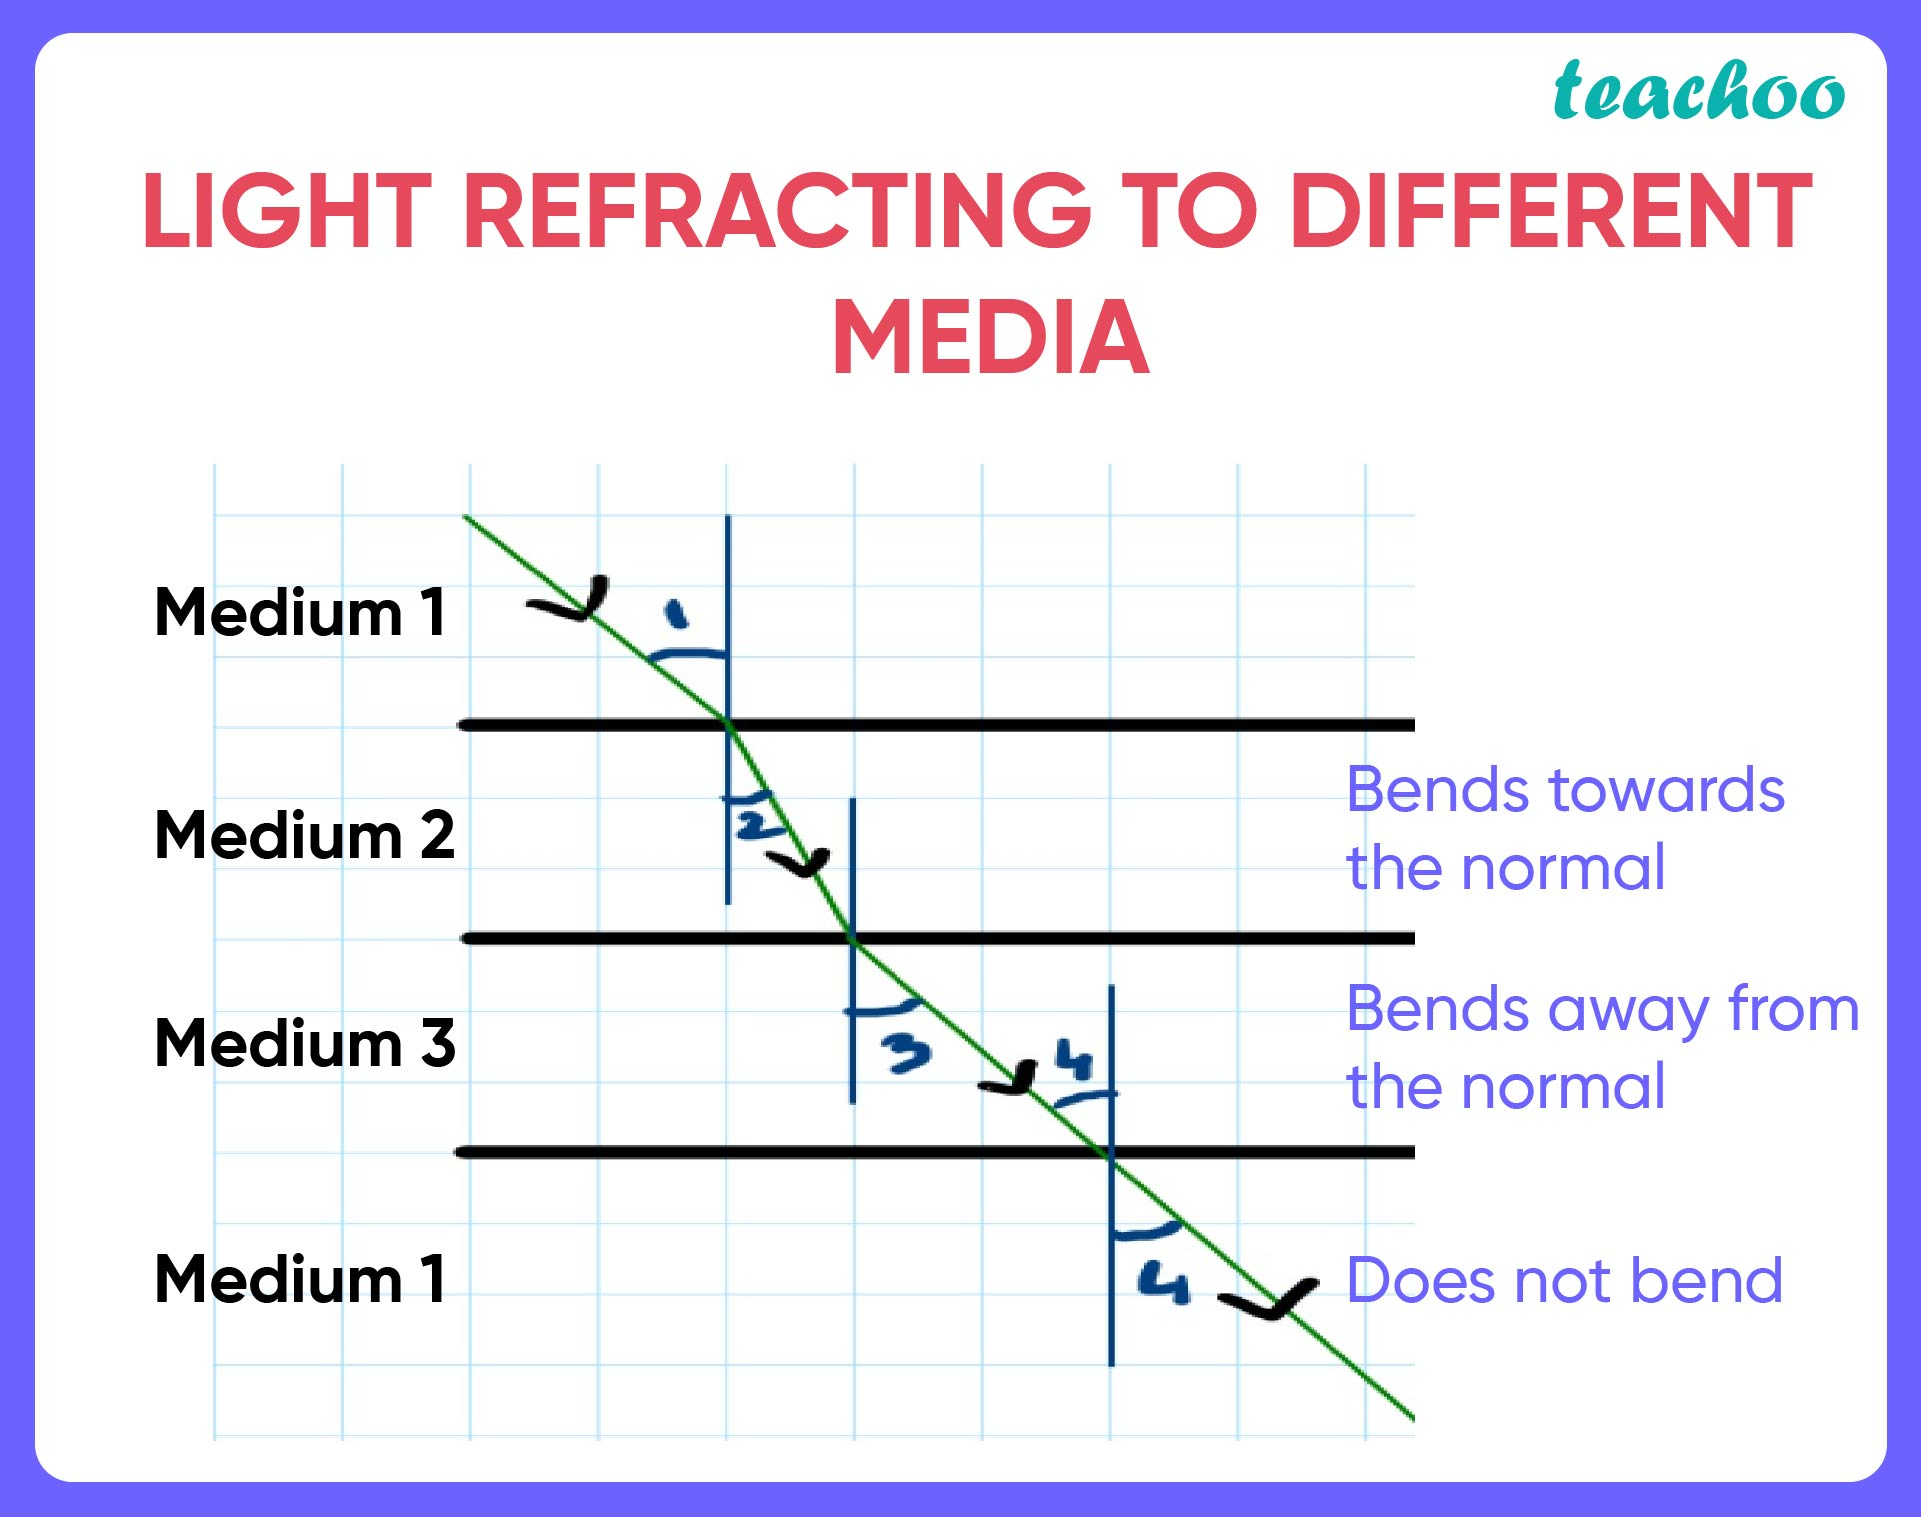 Light refrating to different media-01.jpg